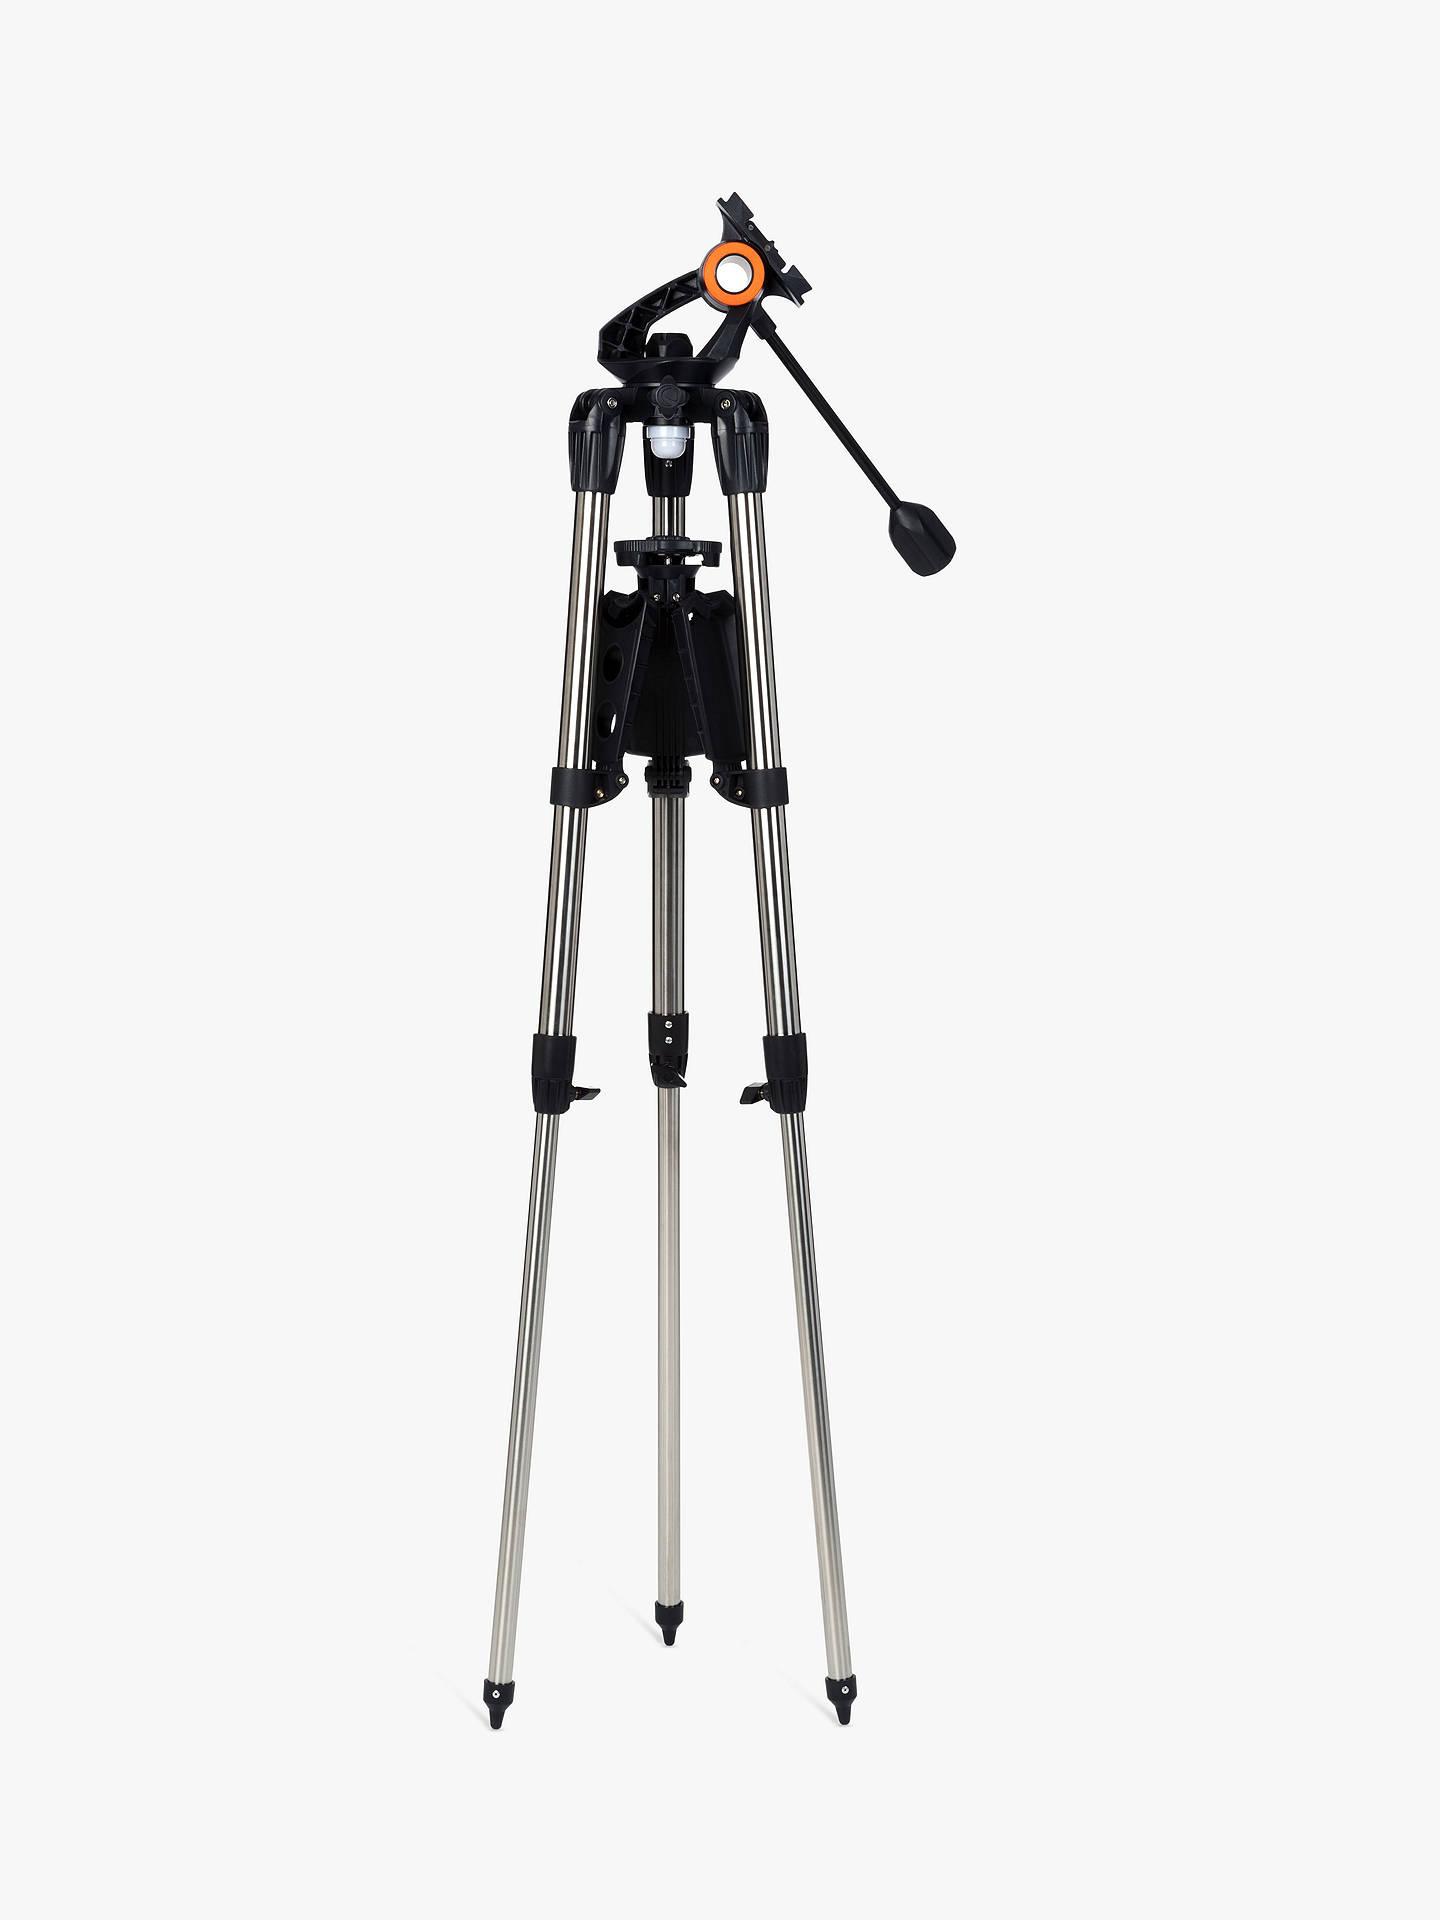 Celestron Inspire 100AZ Refractor Telescope with Smart Phone Adapter